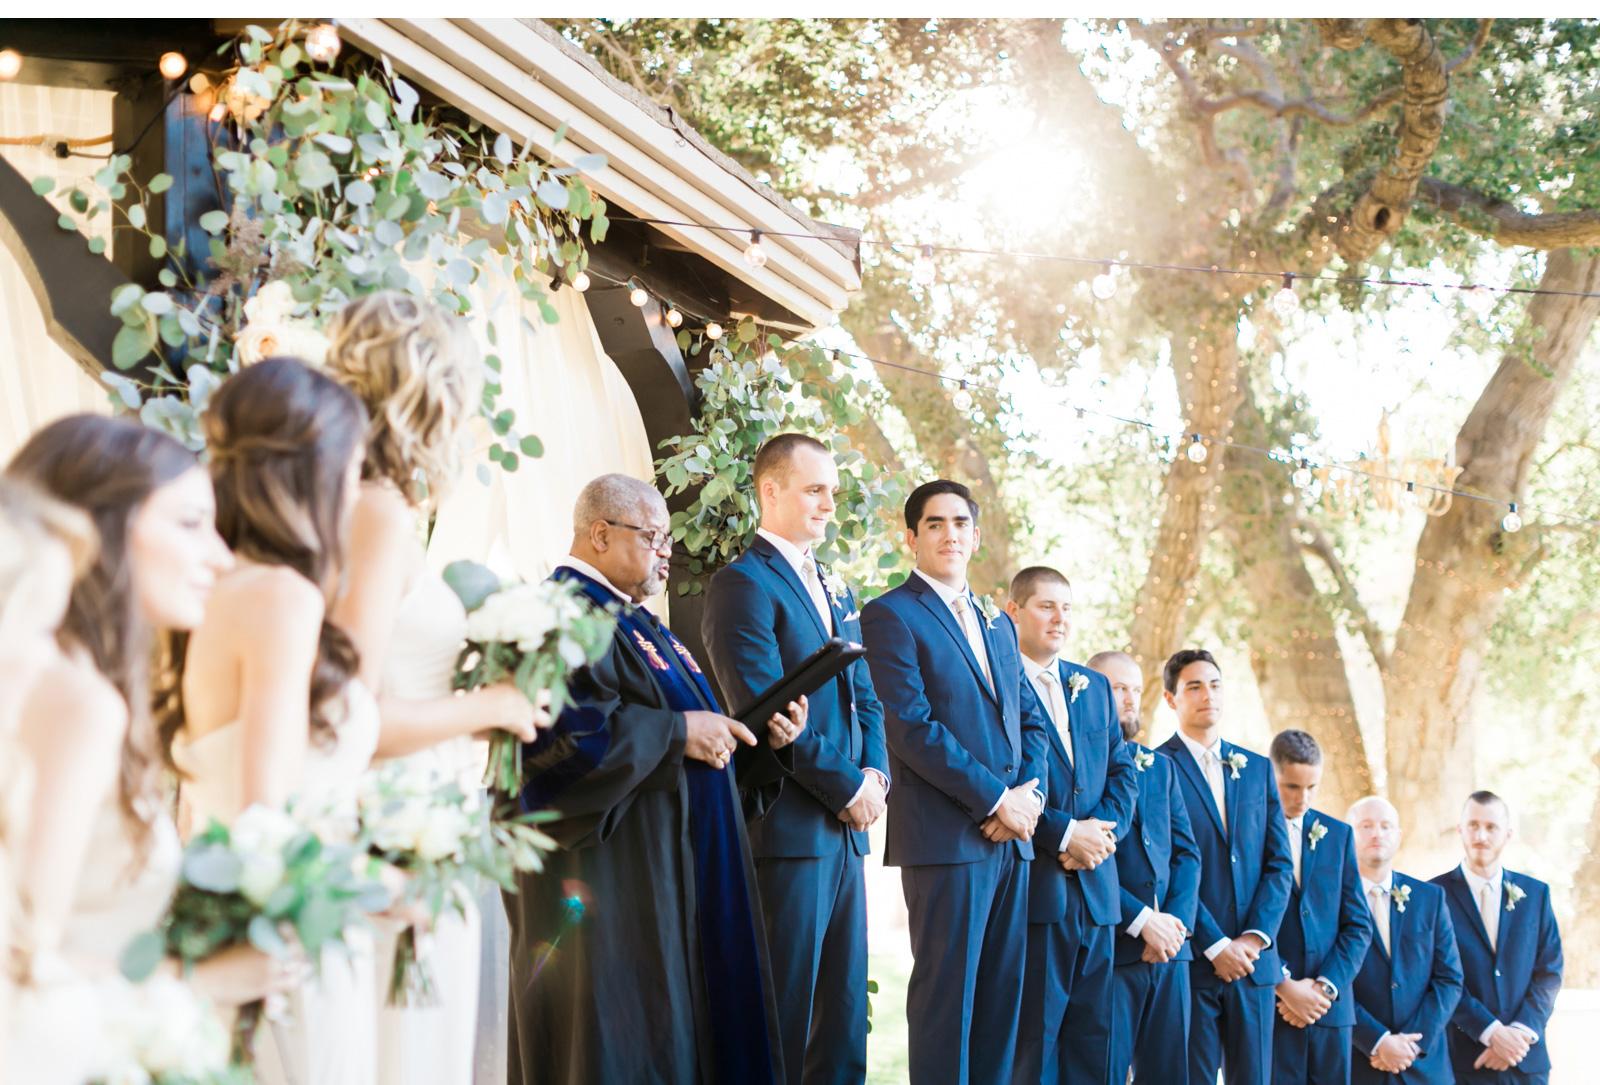 San-Luis-Obispo-Wedding-Photographer-Style-Me-Pretty-Natalie-Schutt-Photography_15.jpg